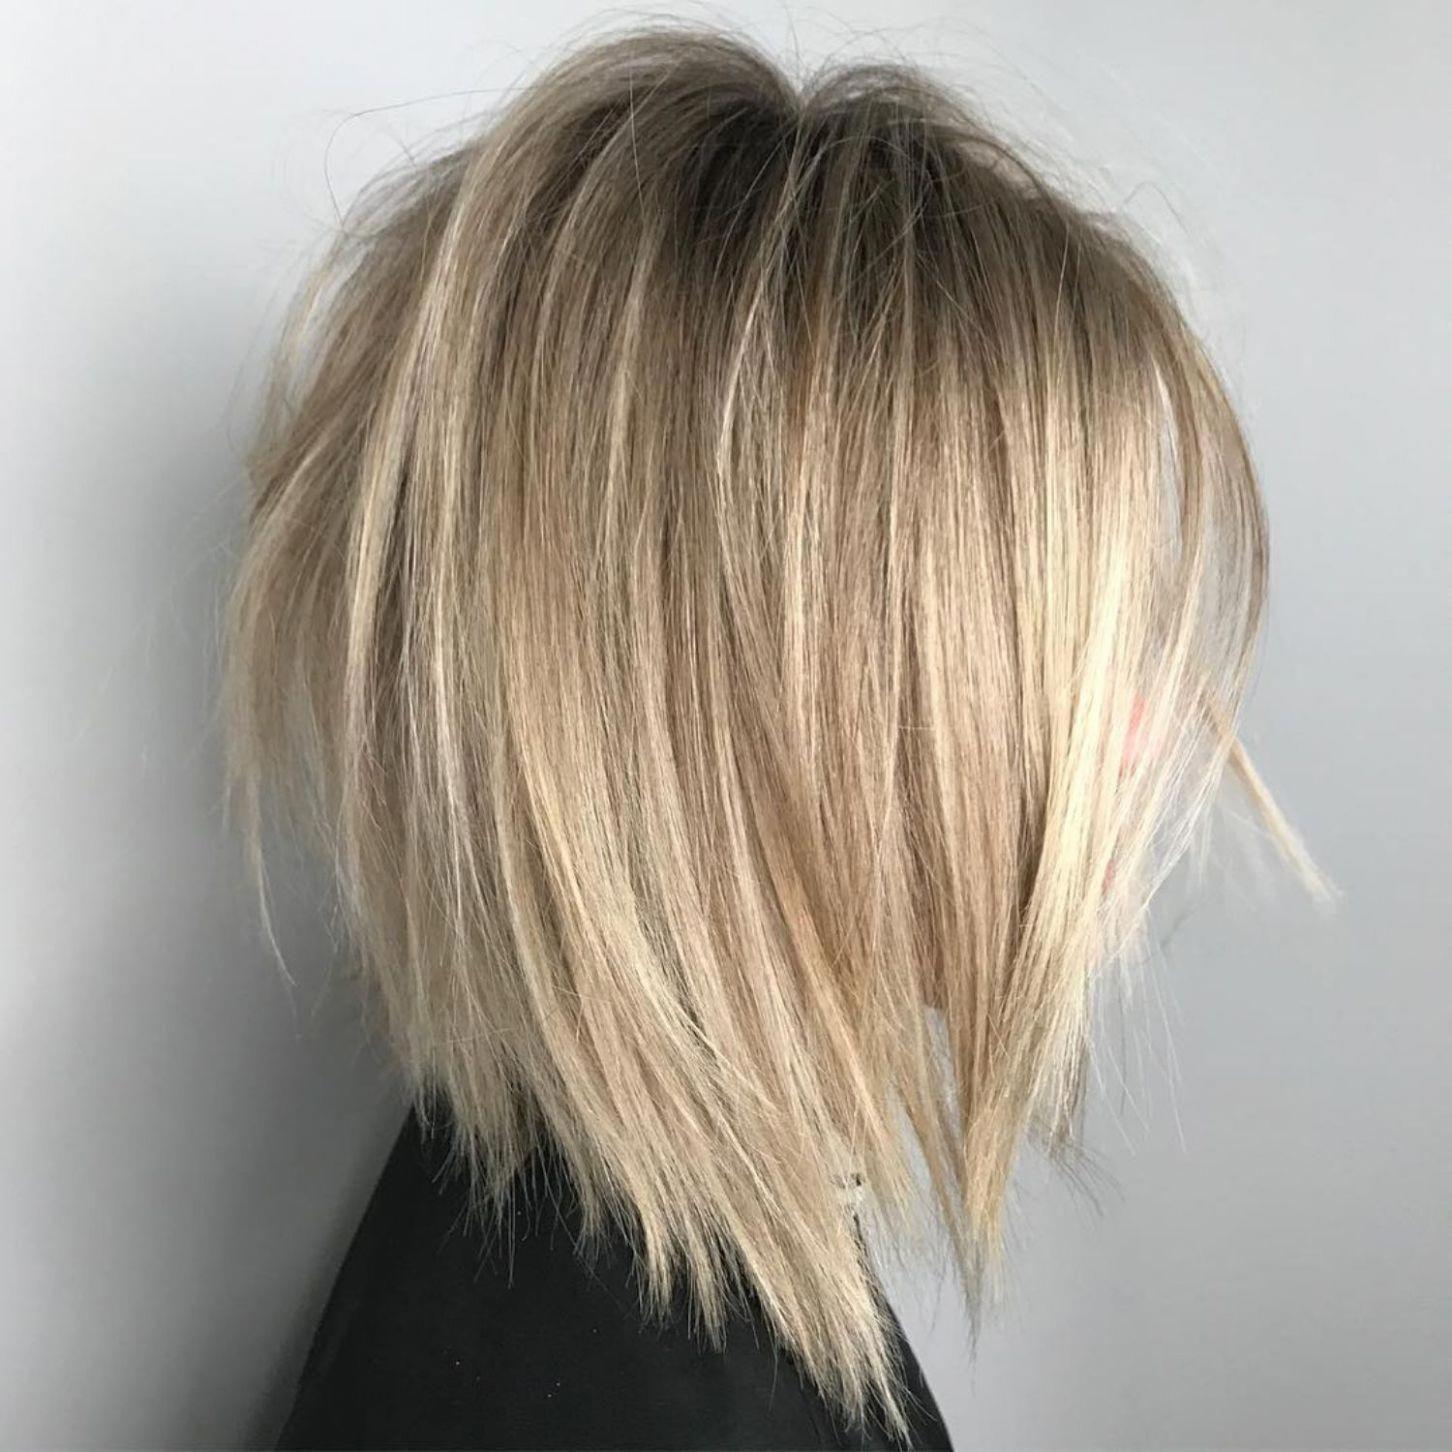 Pin On Bob Style Haircuts